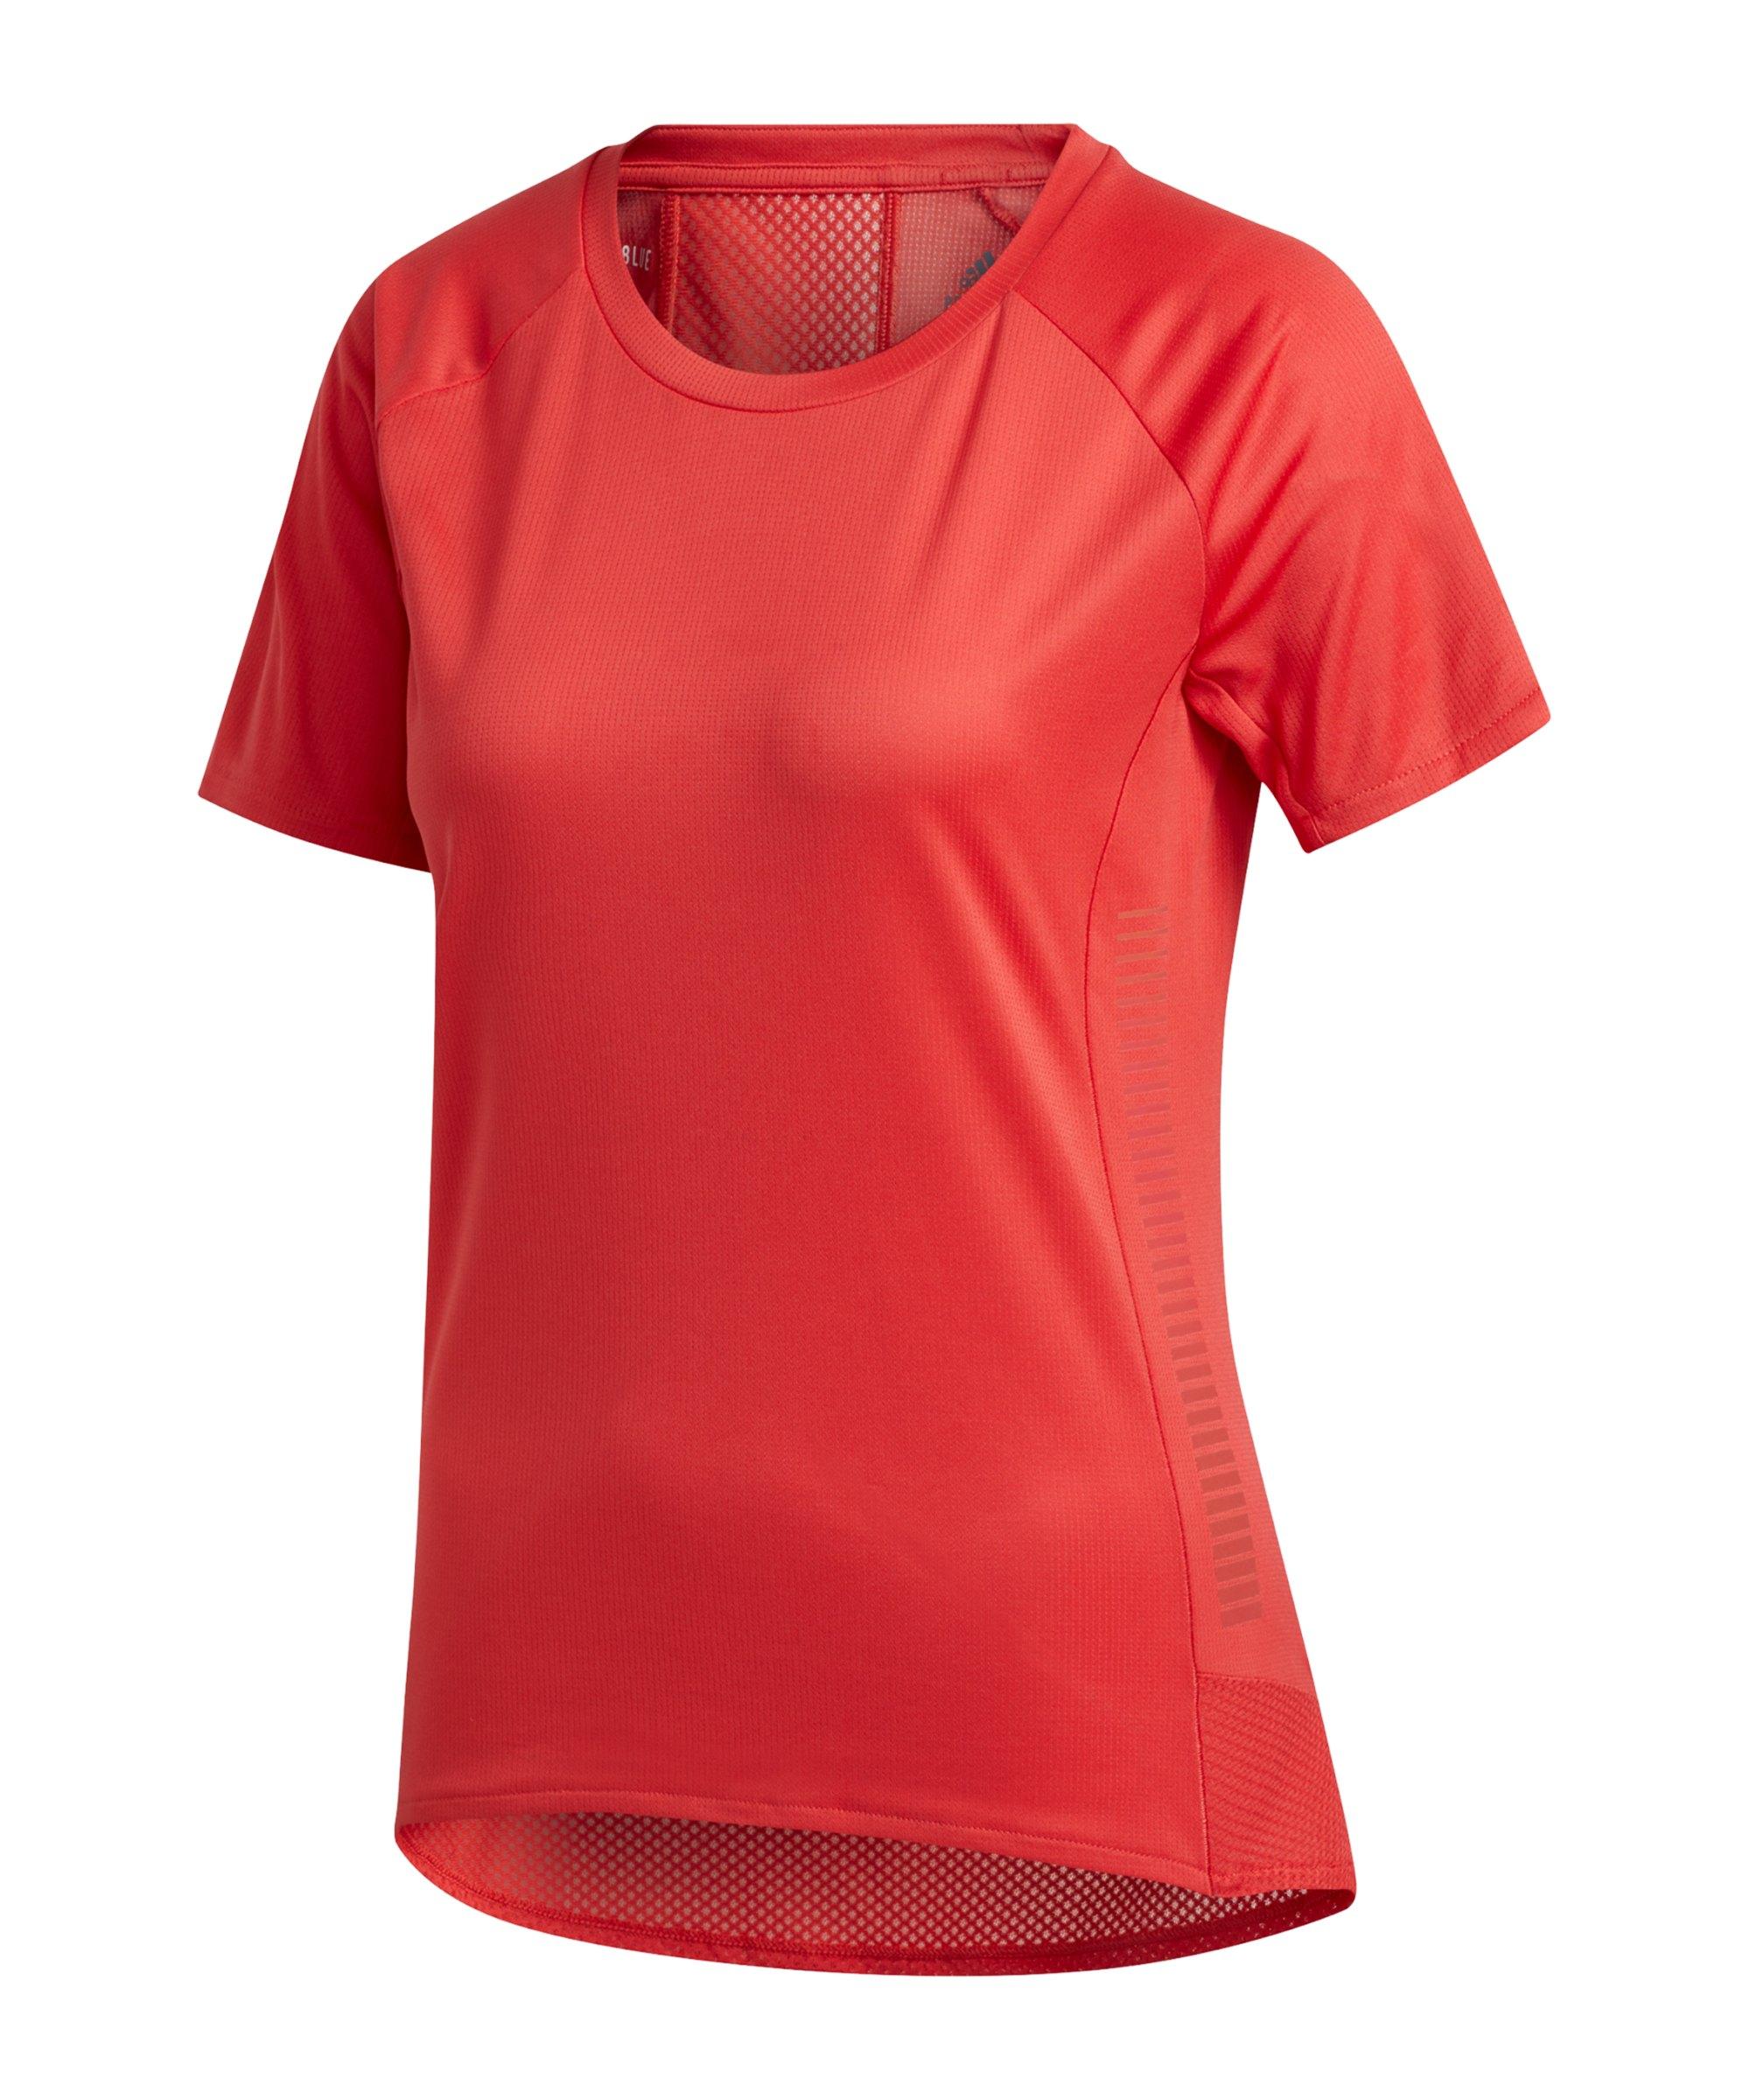 adidas 25/7 T-Shirt Running Damen Rot - rot